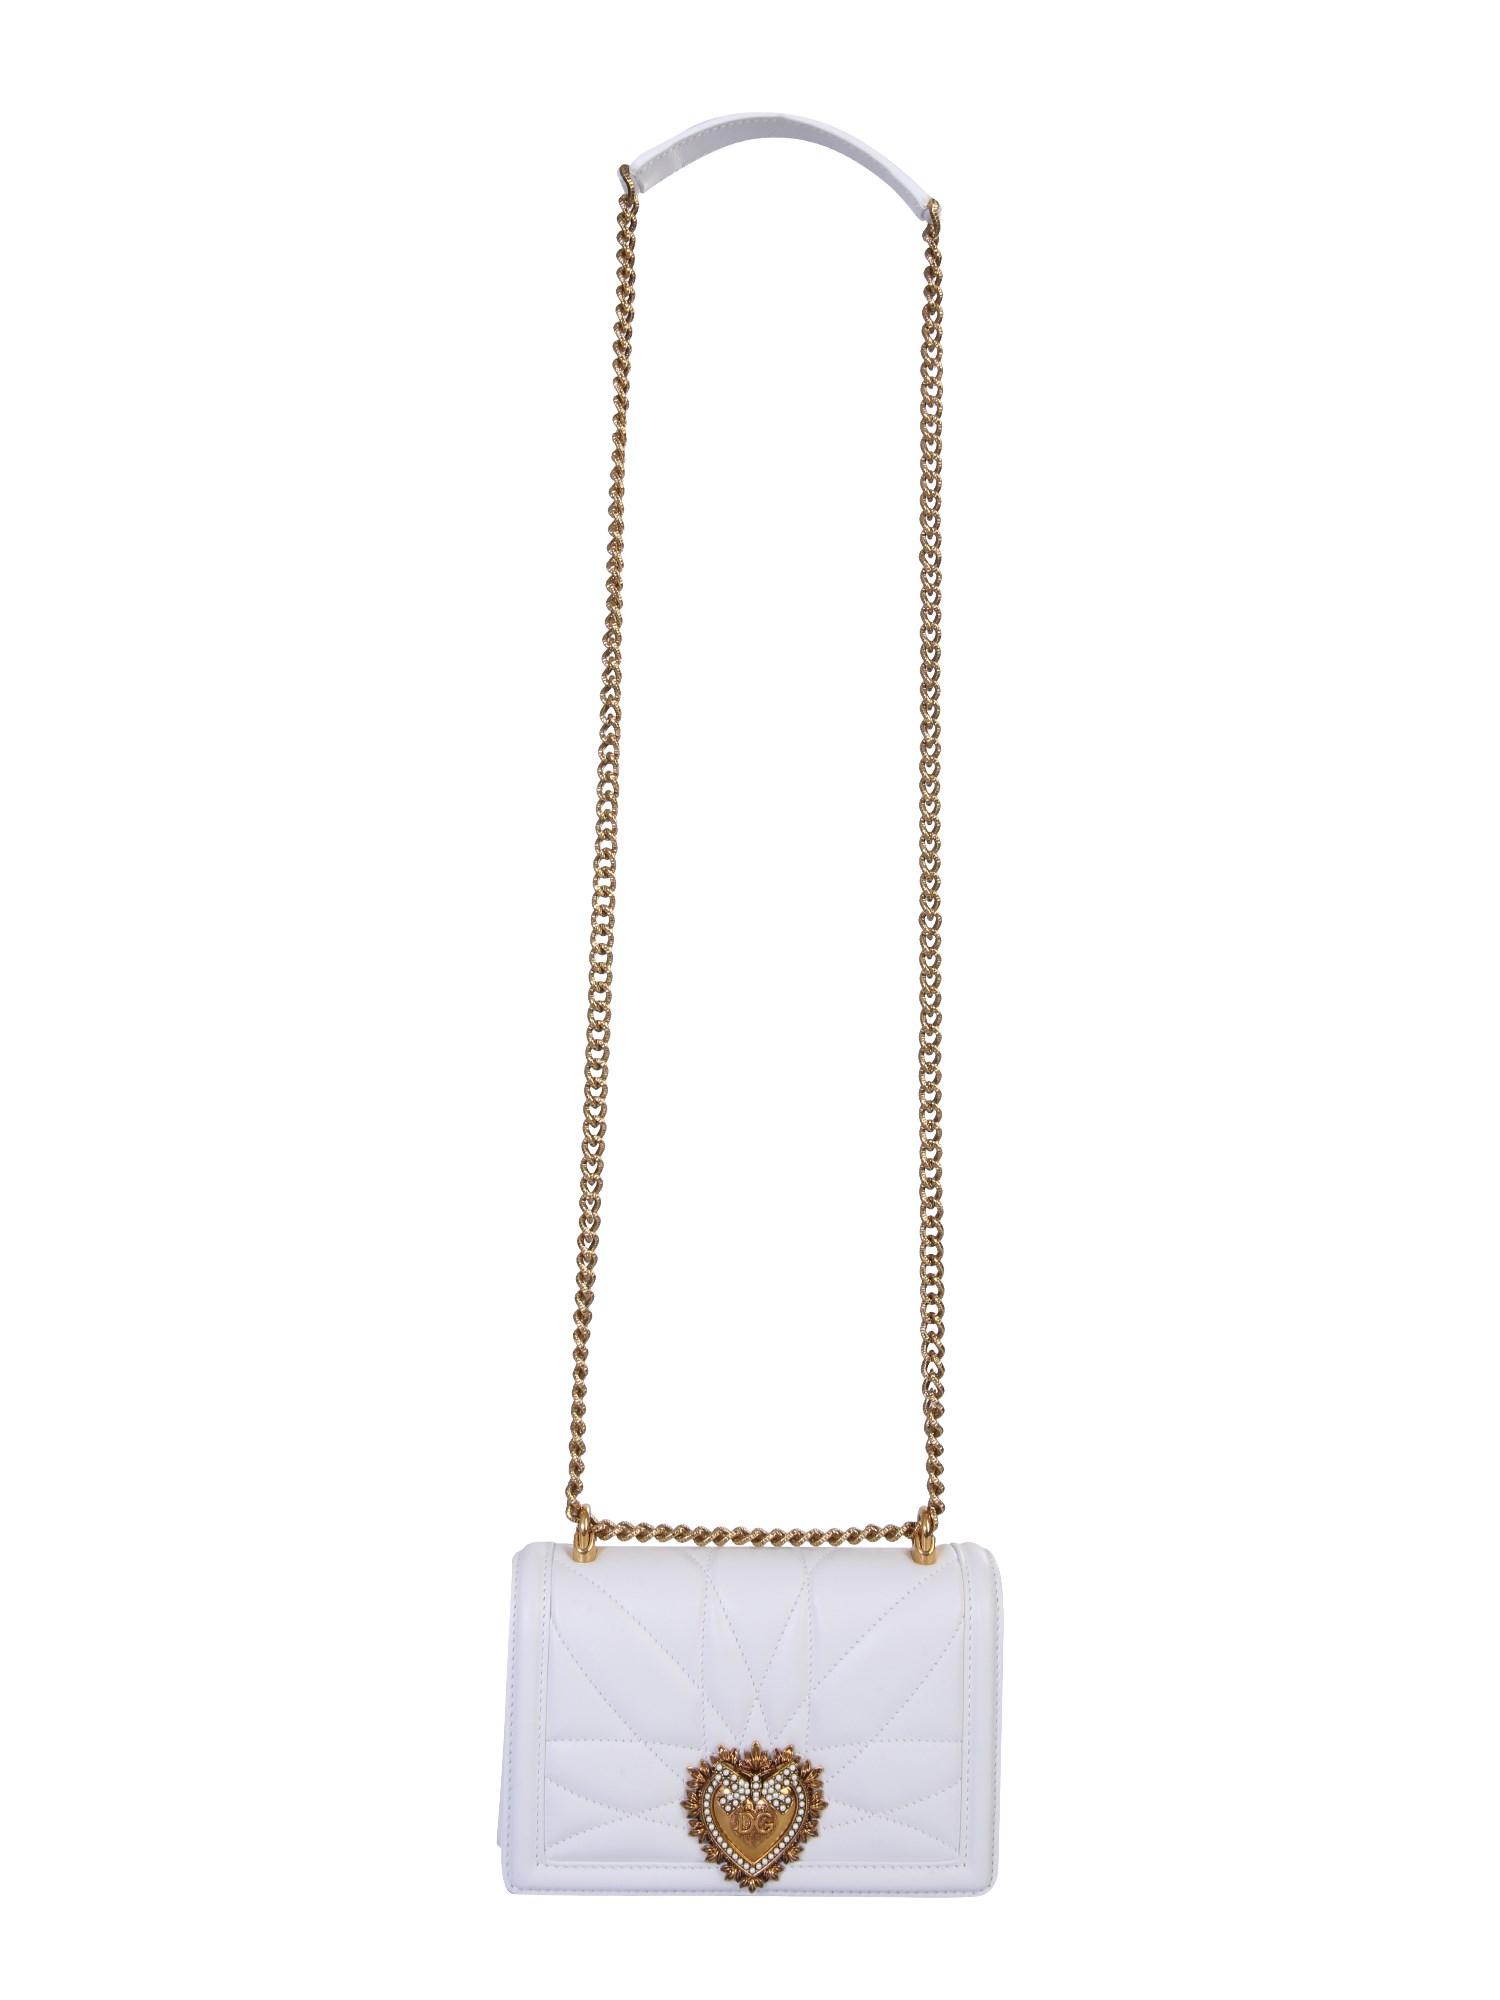 "Dolce & Gabbana ""DEVOTION"" BAG"